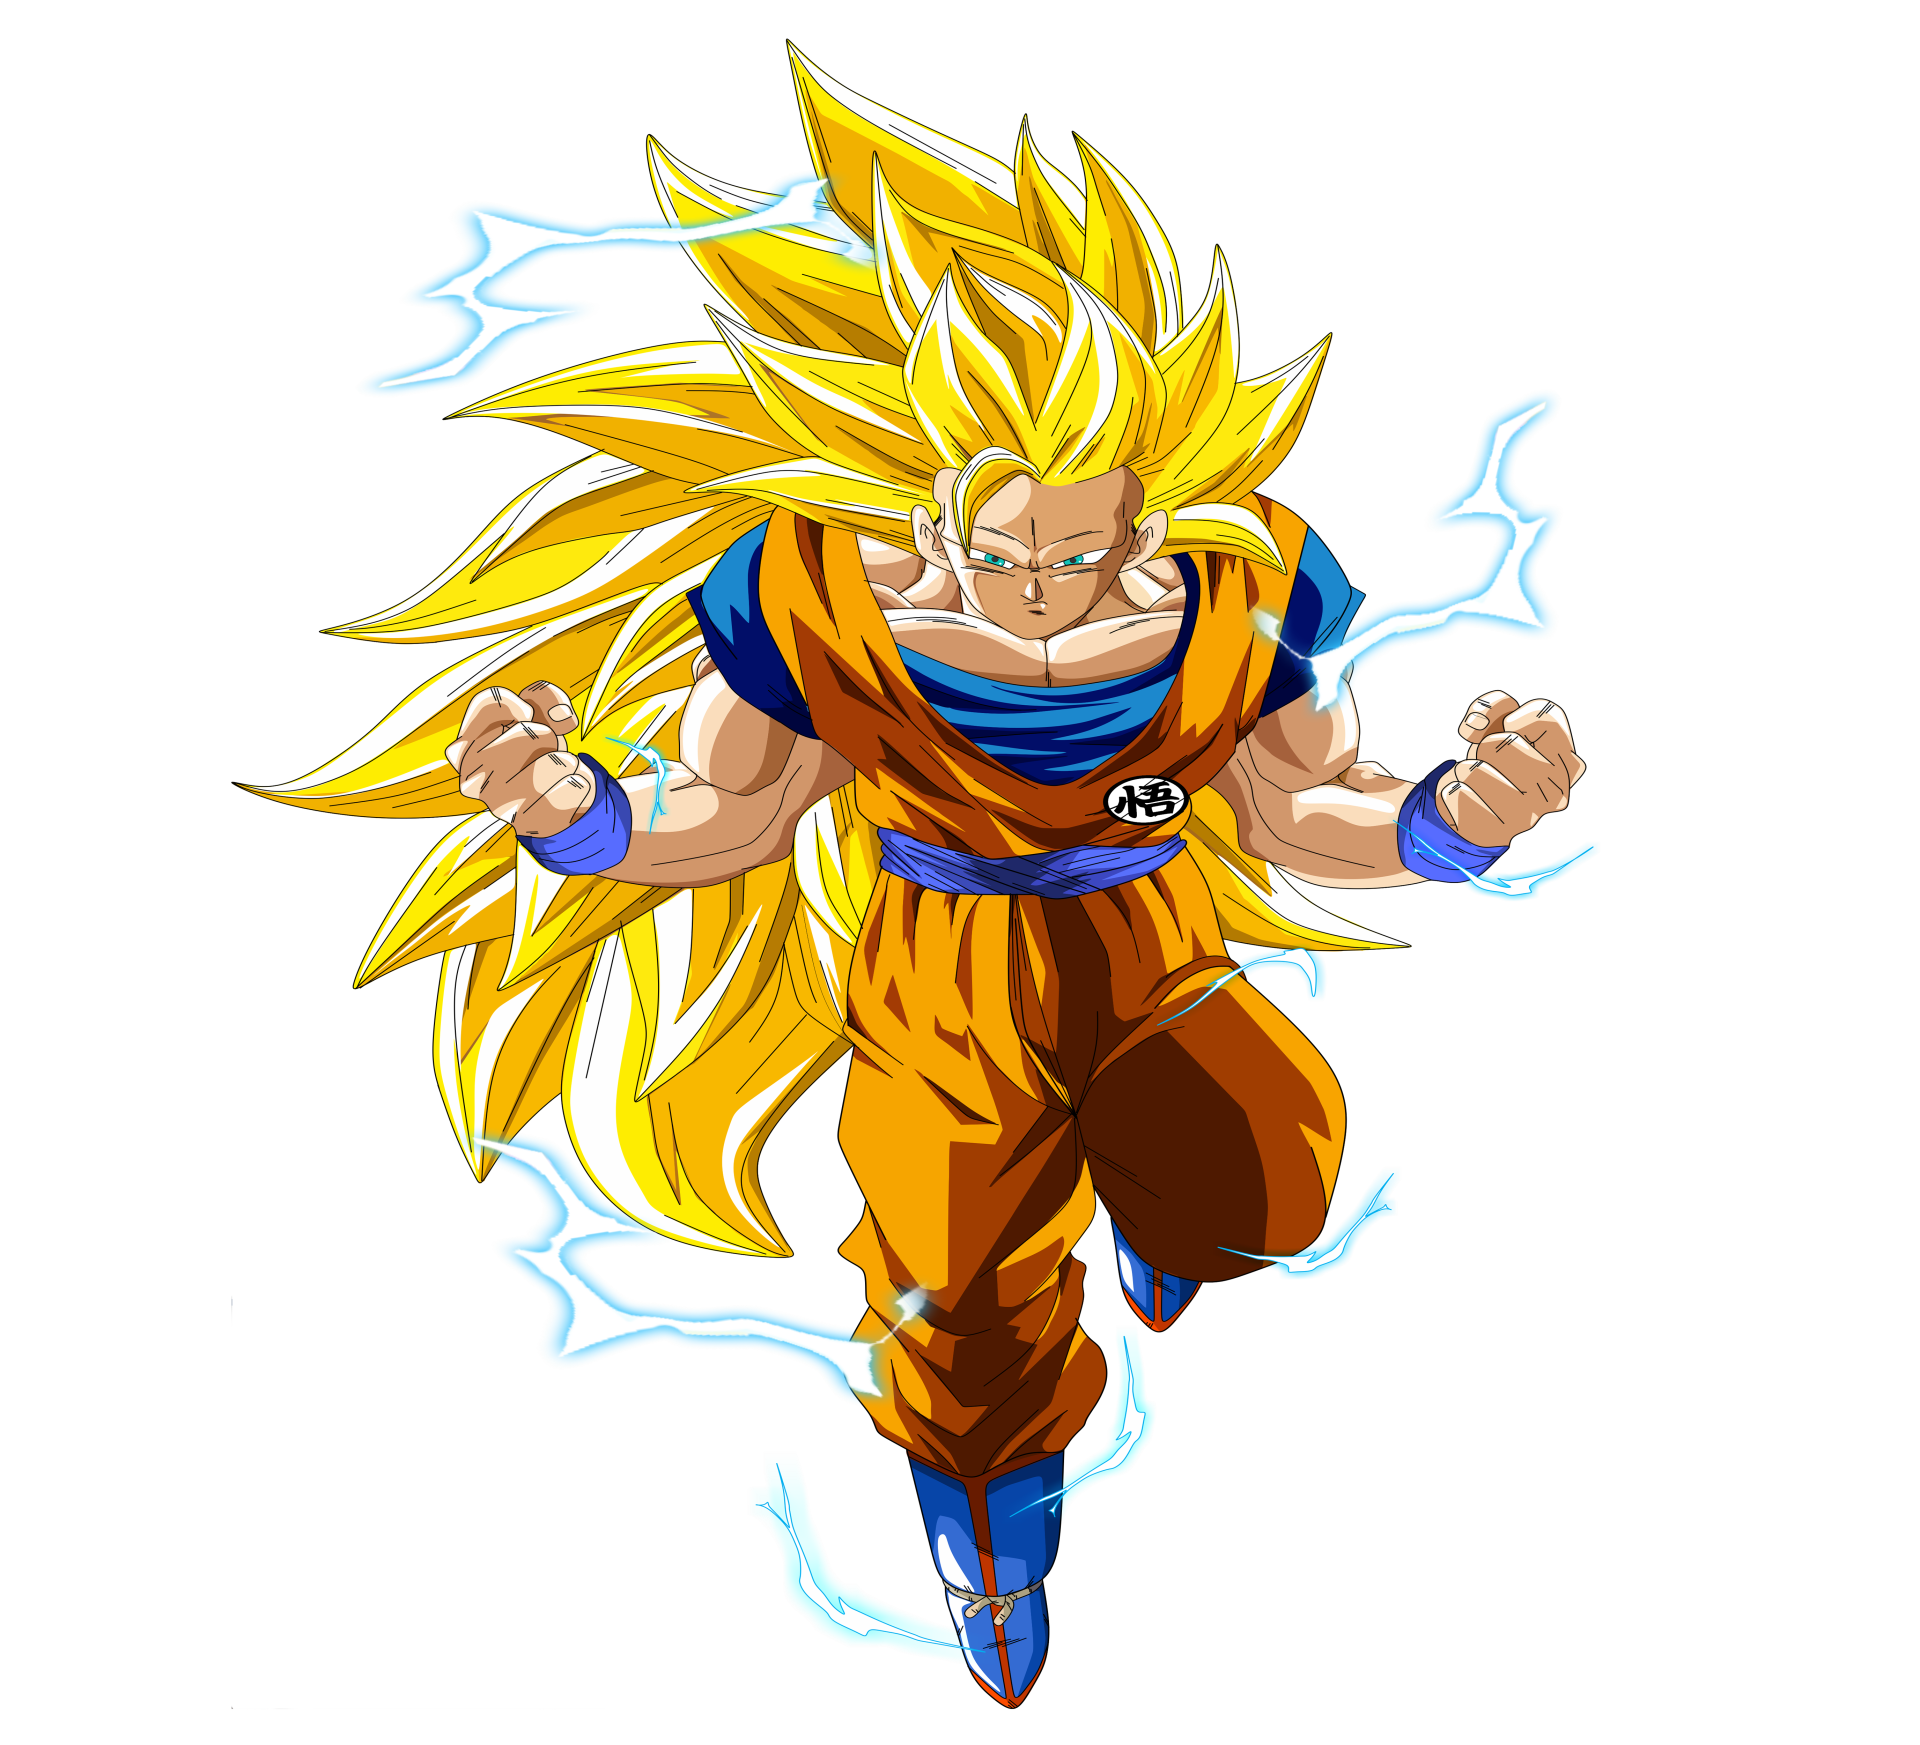 Goku ssj3 5k retina ultra hd fond d 39 cran and arri re plan for Fond ecran goku